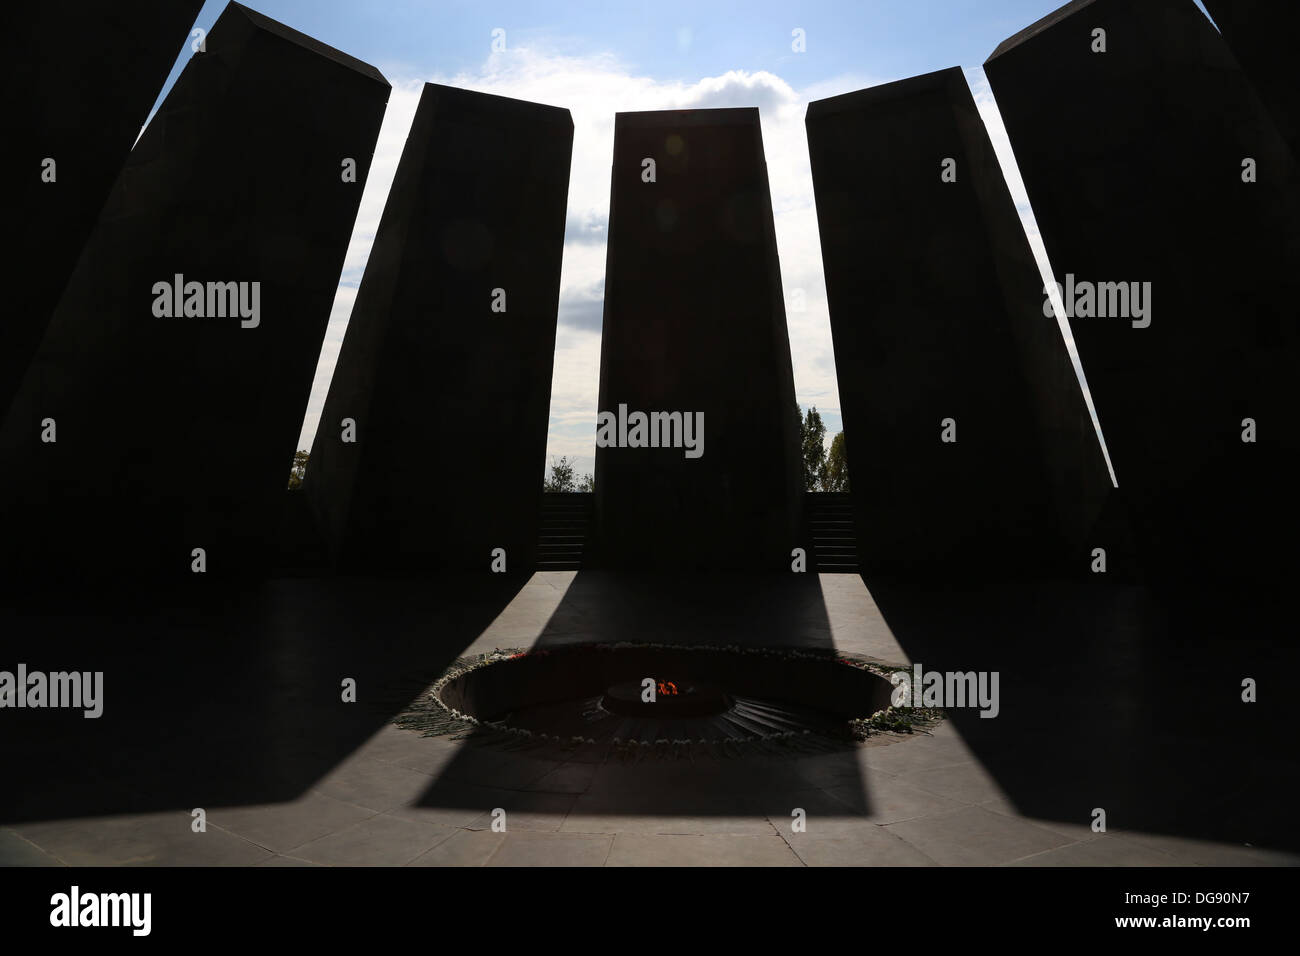 Armenia, genocide memorial, Yerevan - Stock Image